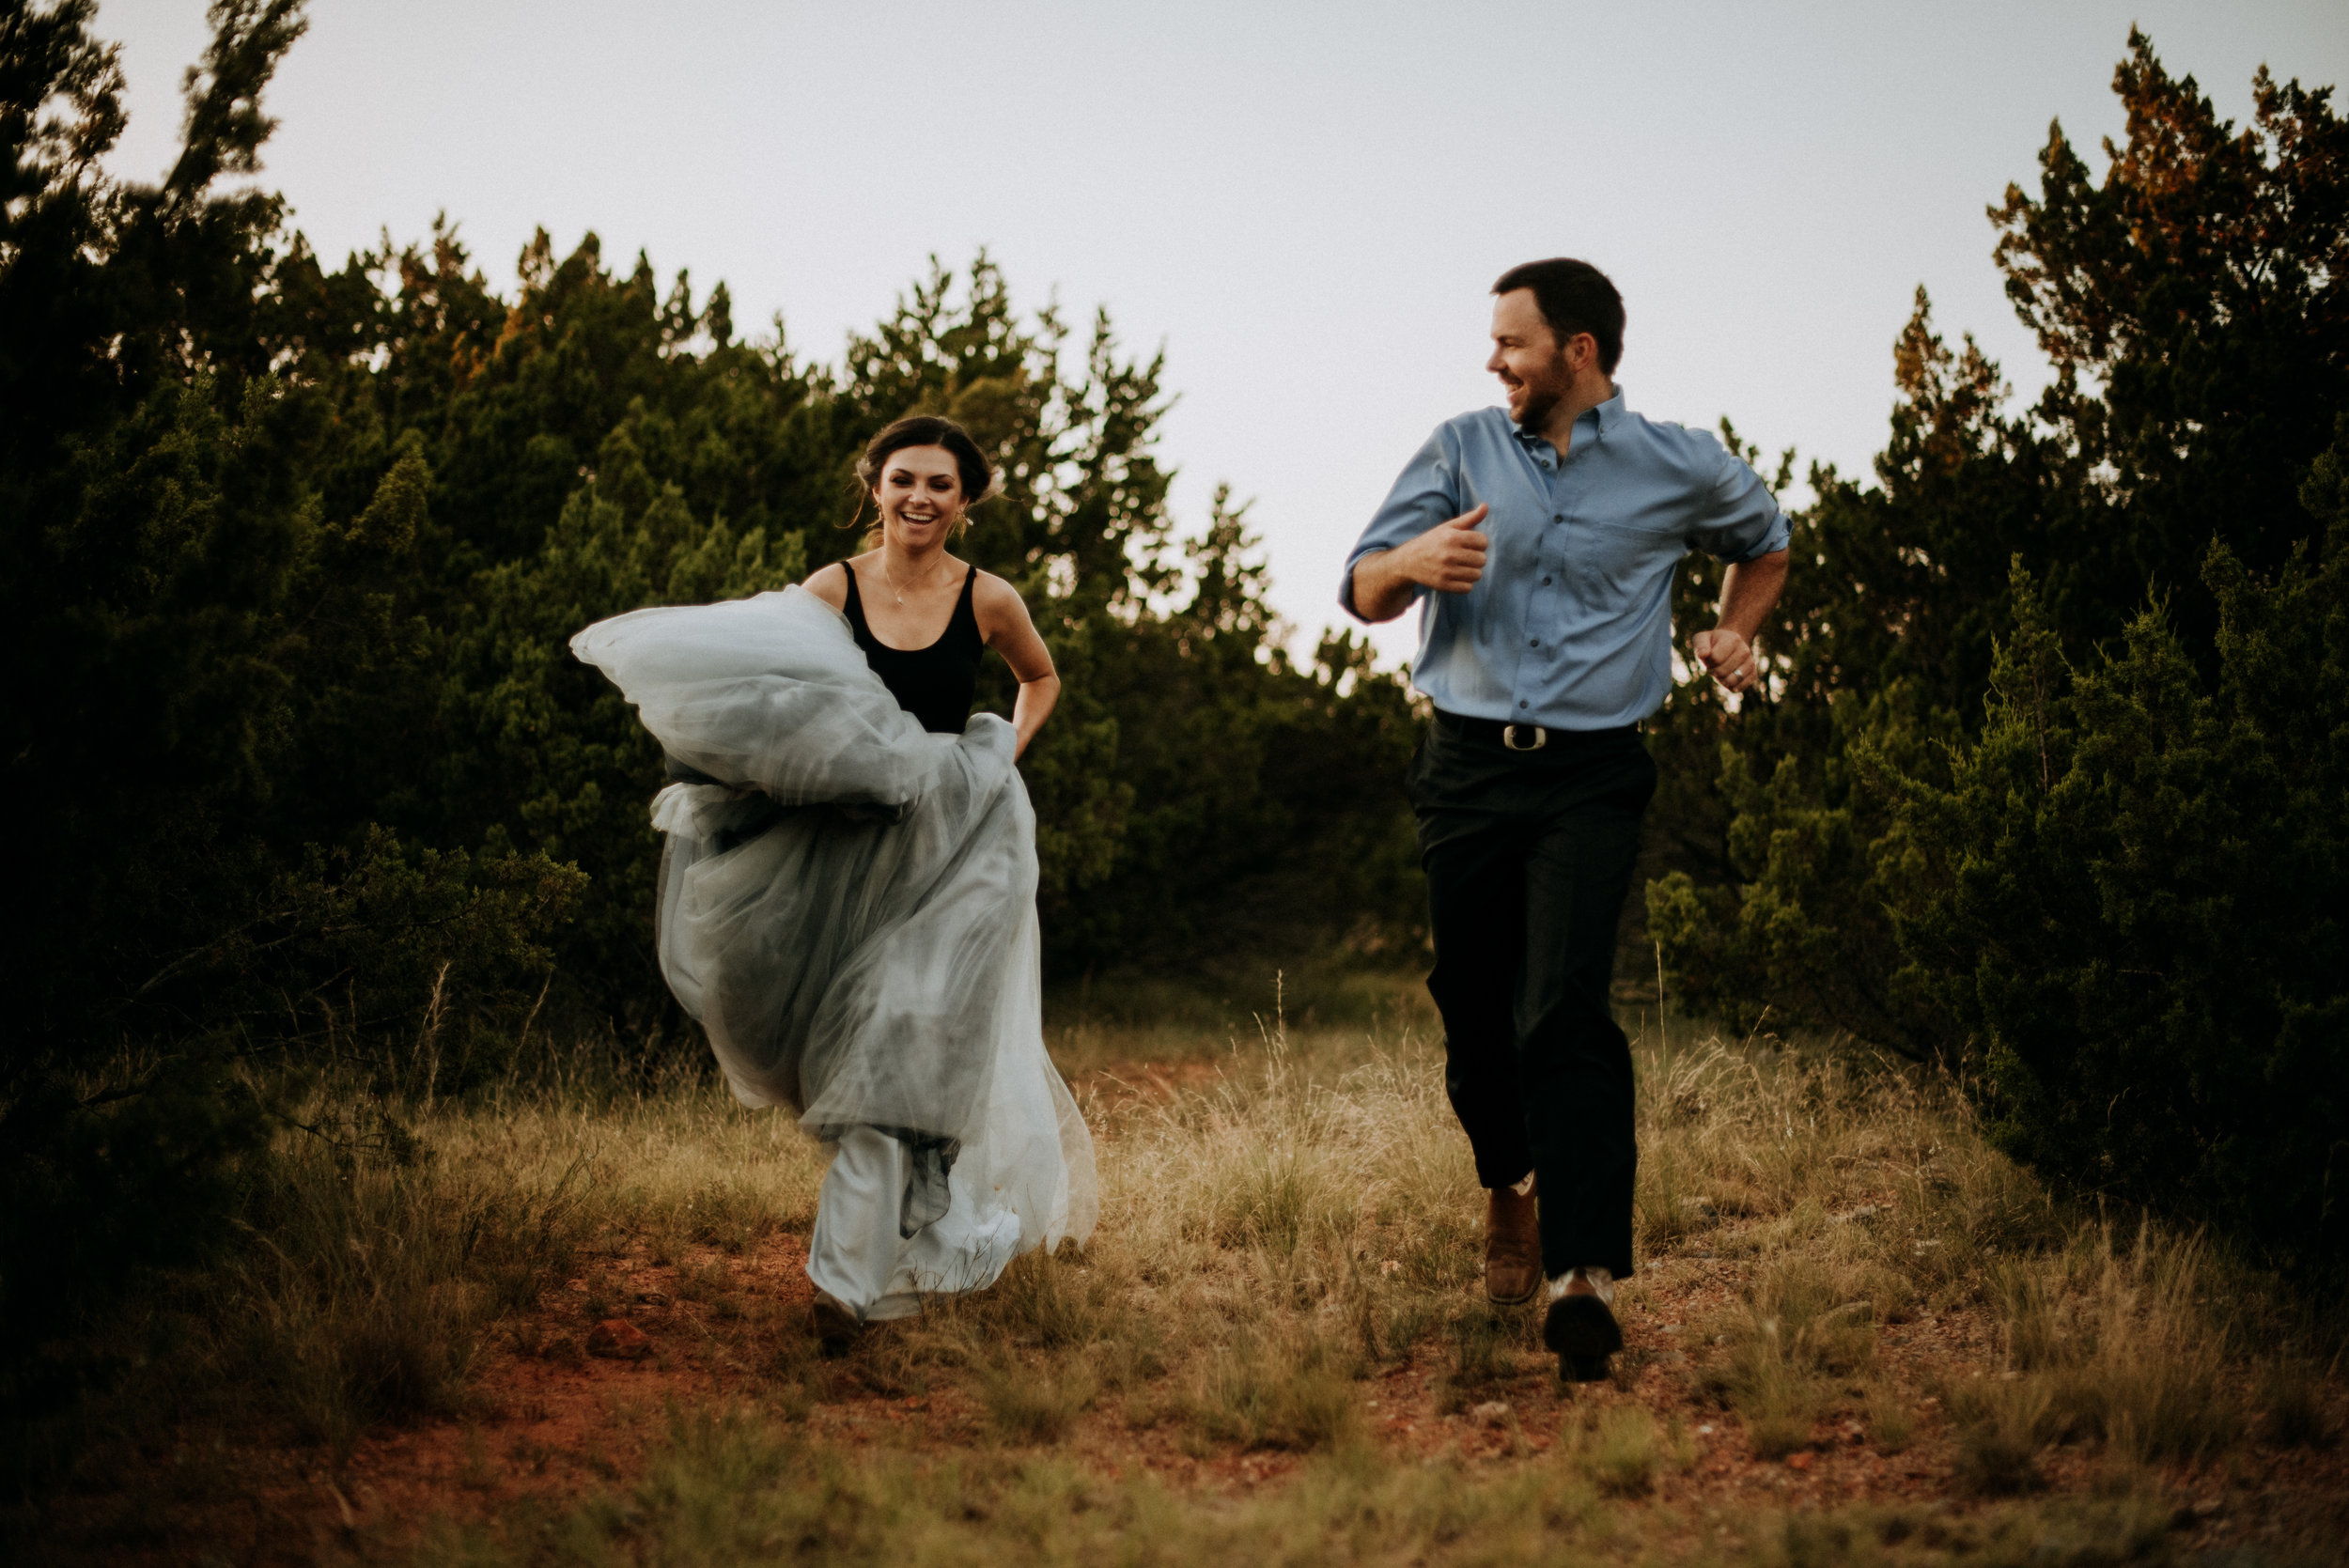 weddingworkshop_DSC2043.jpg